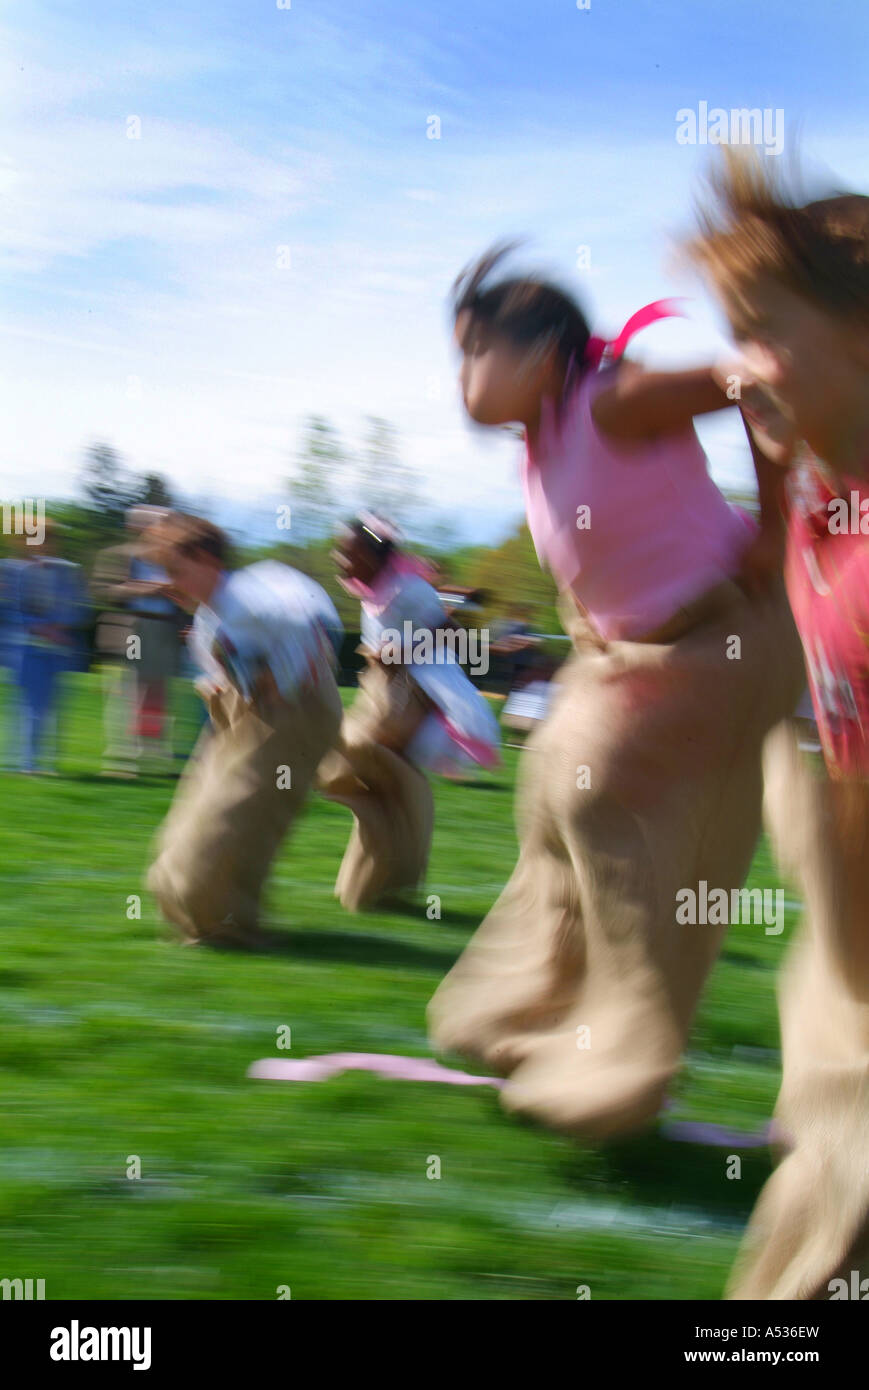 elementary-school-spring-field-day-sack-race-A536EW.jpg